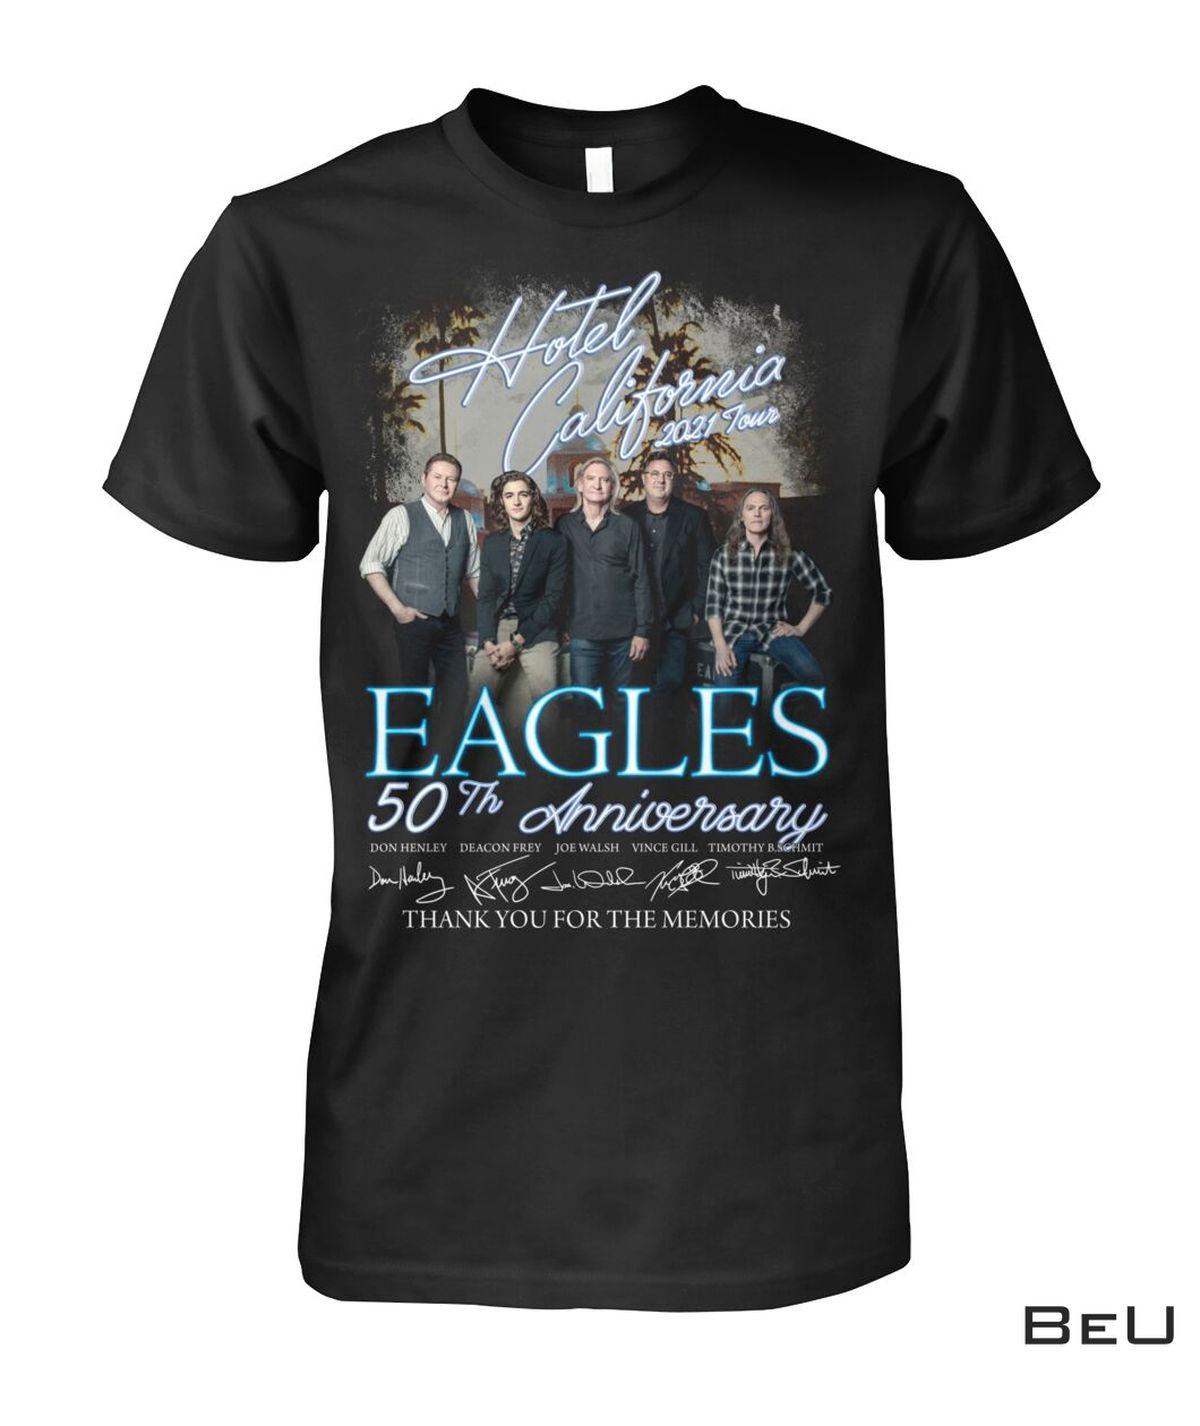 Free Ship Hotel California 2021 Tour Eagles 50th Anniversary Shirt, hoodie, tank top